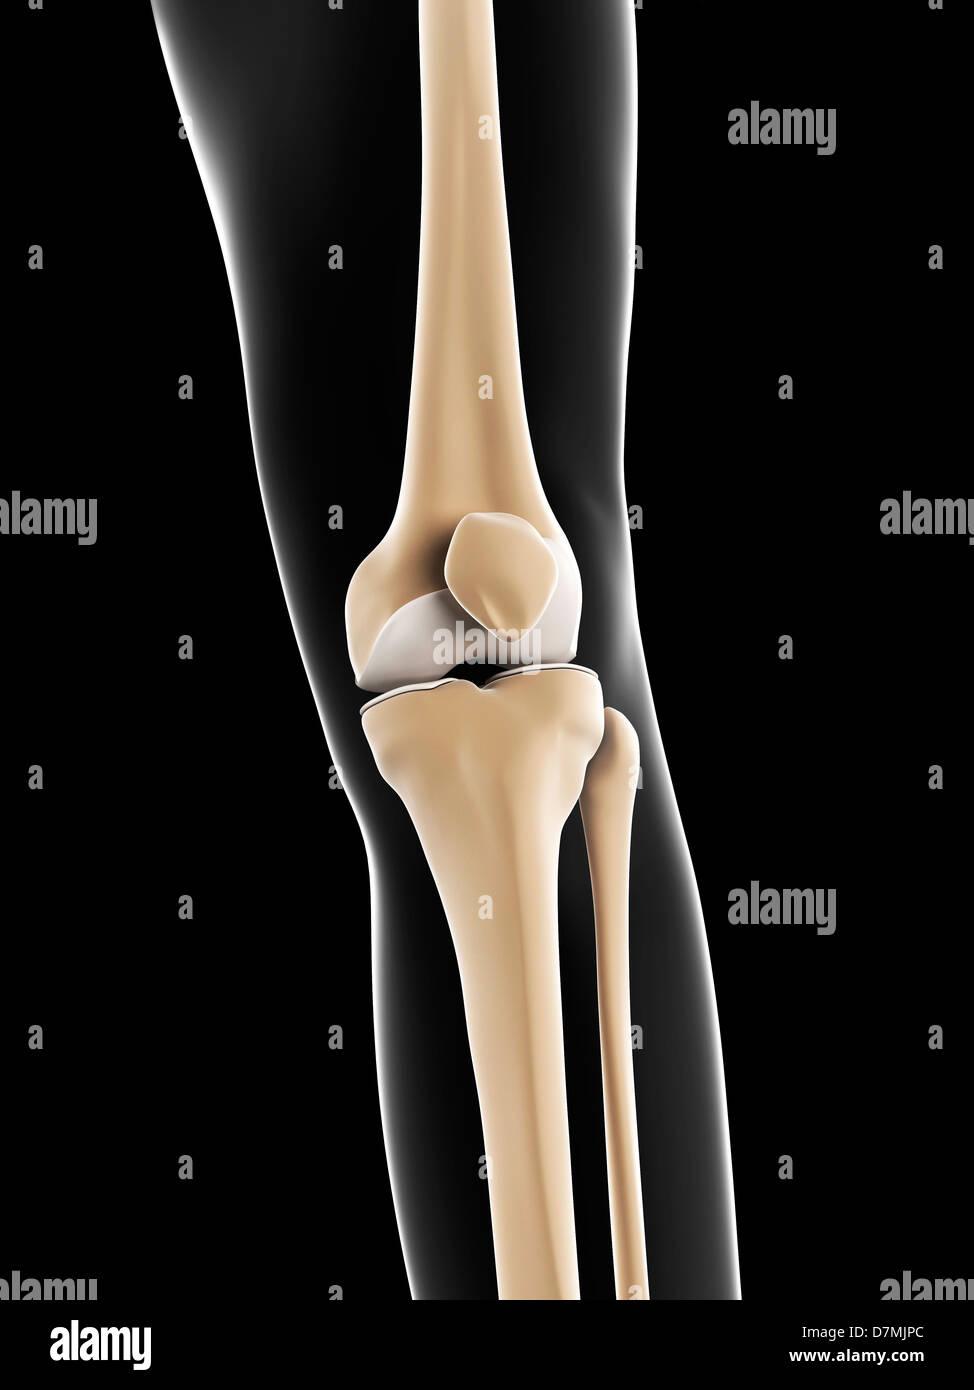 Male Knee Anatomy Bones Stock Photos Male Knee Anatomy Bones Stock